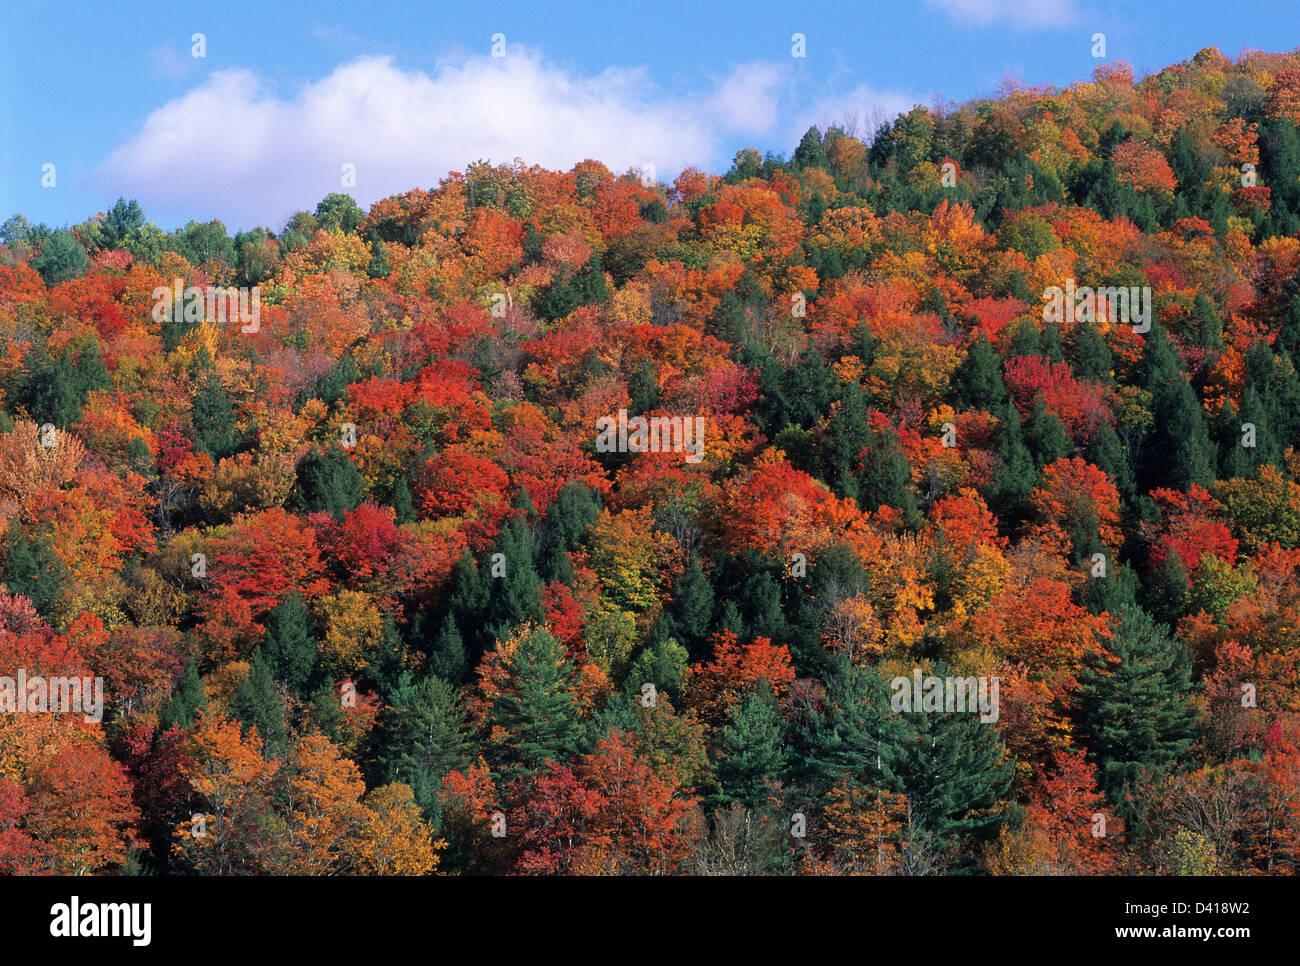 Elk280-1089 Vermont, East Vermont, autumn foliage along rural highway - Stock Image